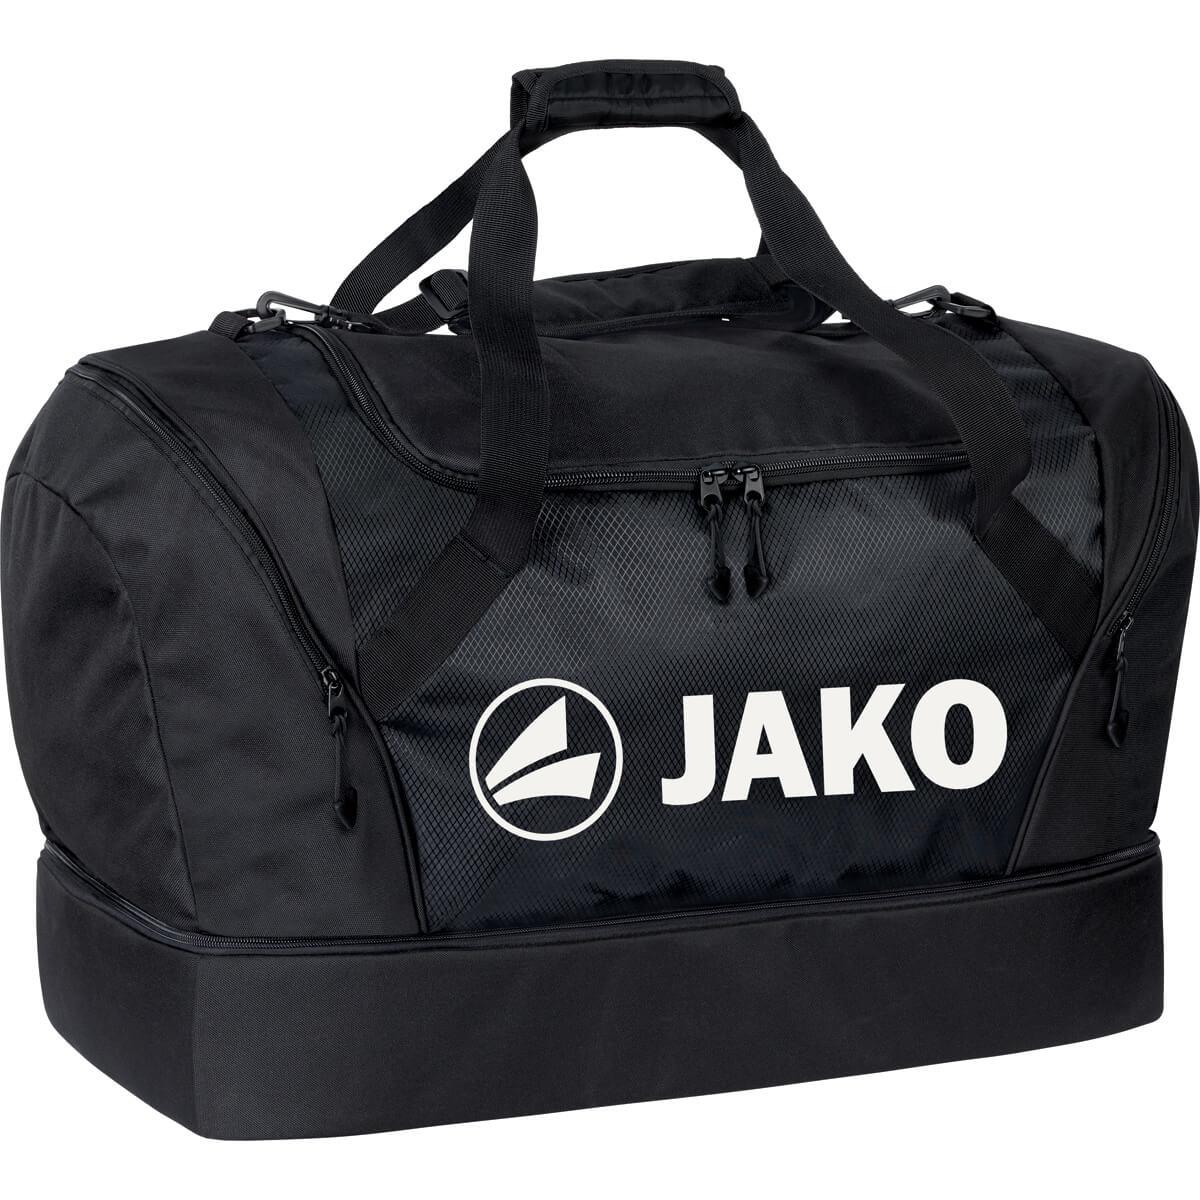 Jako Sporttasche JAKO  2089  | div. Größen / Farben